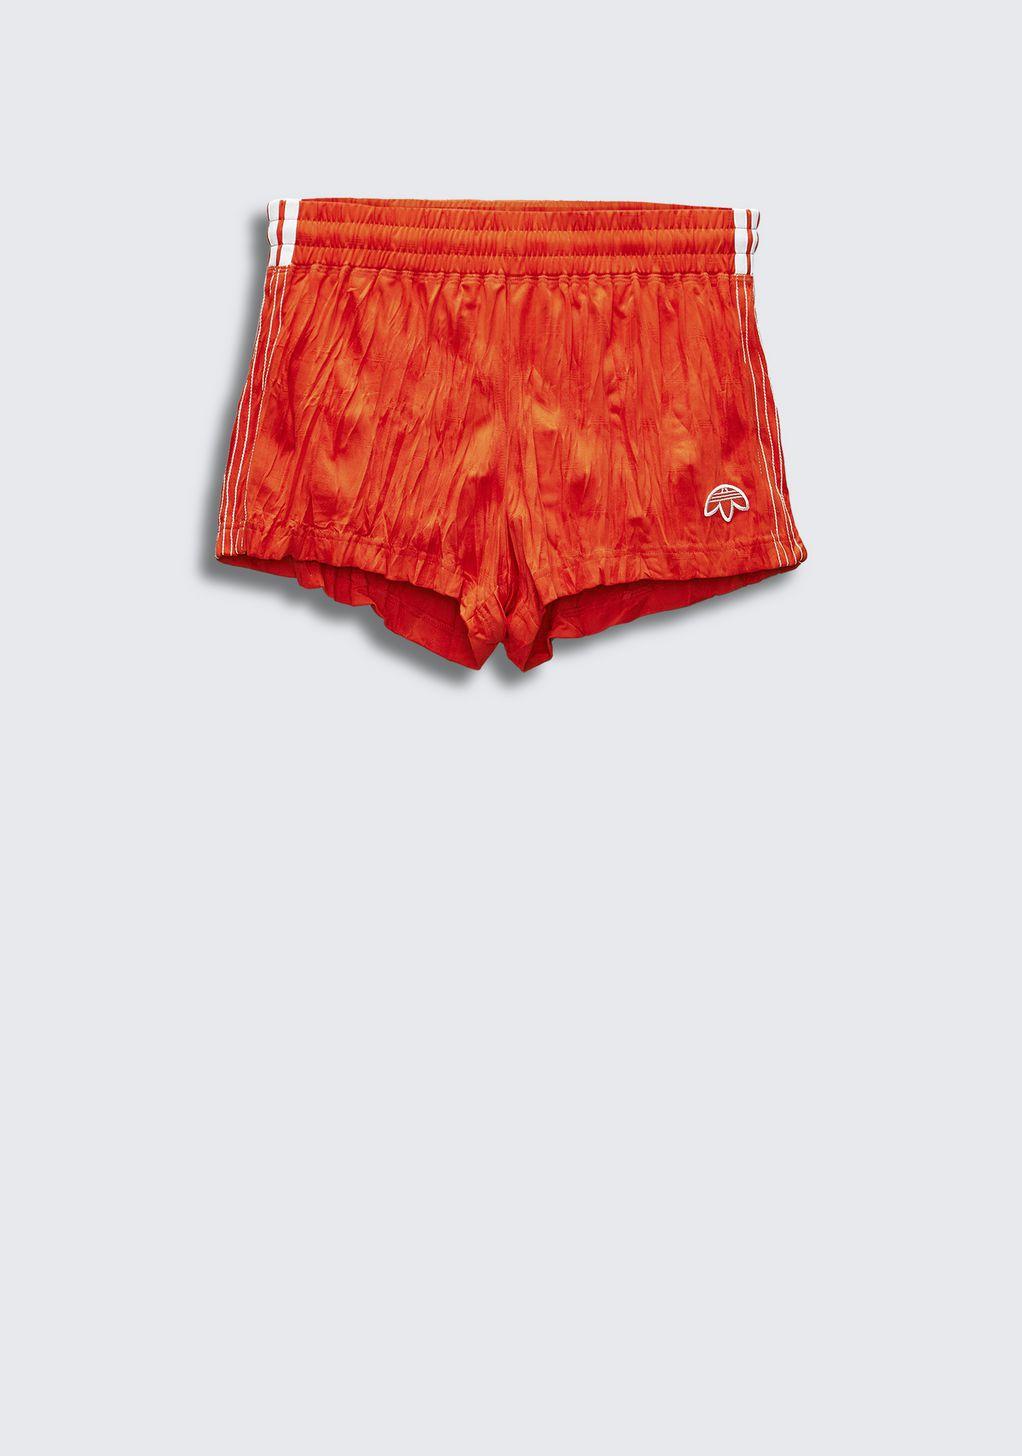 Alexander wang adidas originali da oh pantaloncini corti